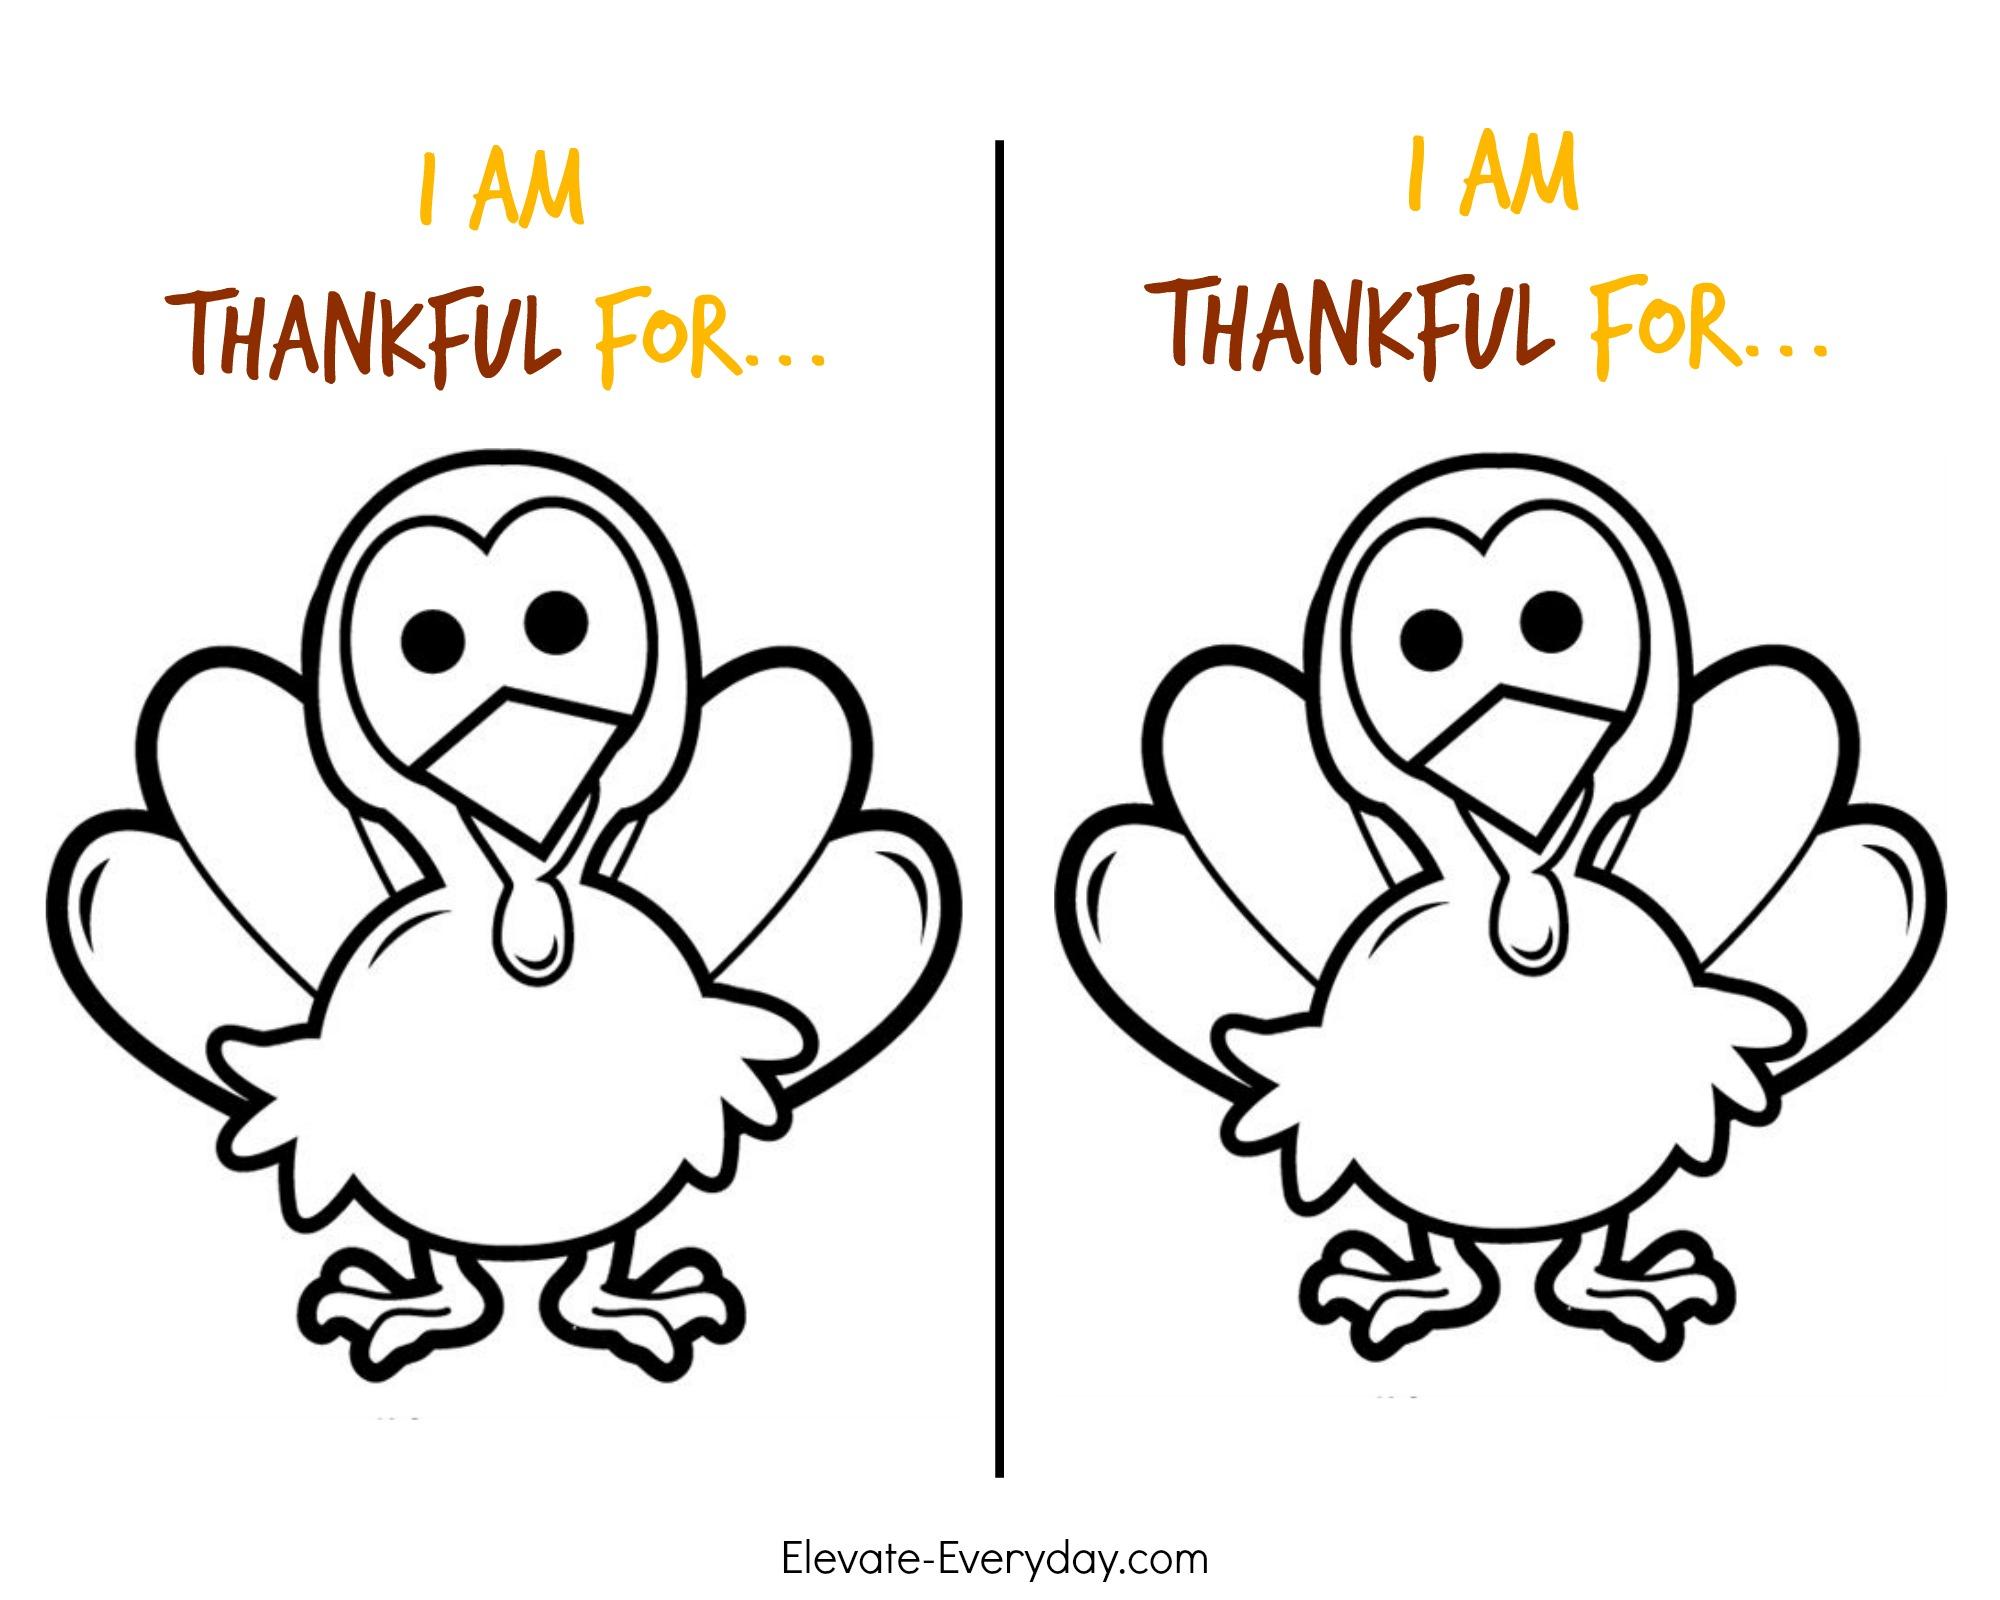 Children's Thanksgiving Activity | Thankful Turkeys - Elevate Everyday - Free Turkey Cut Out Printable